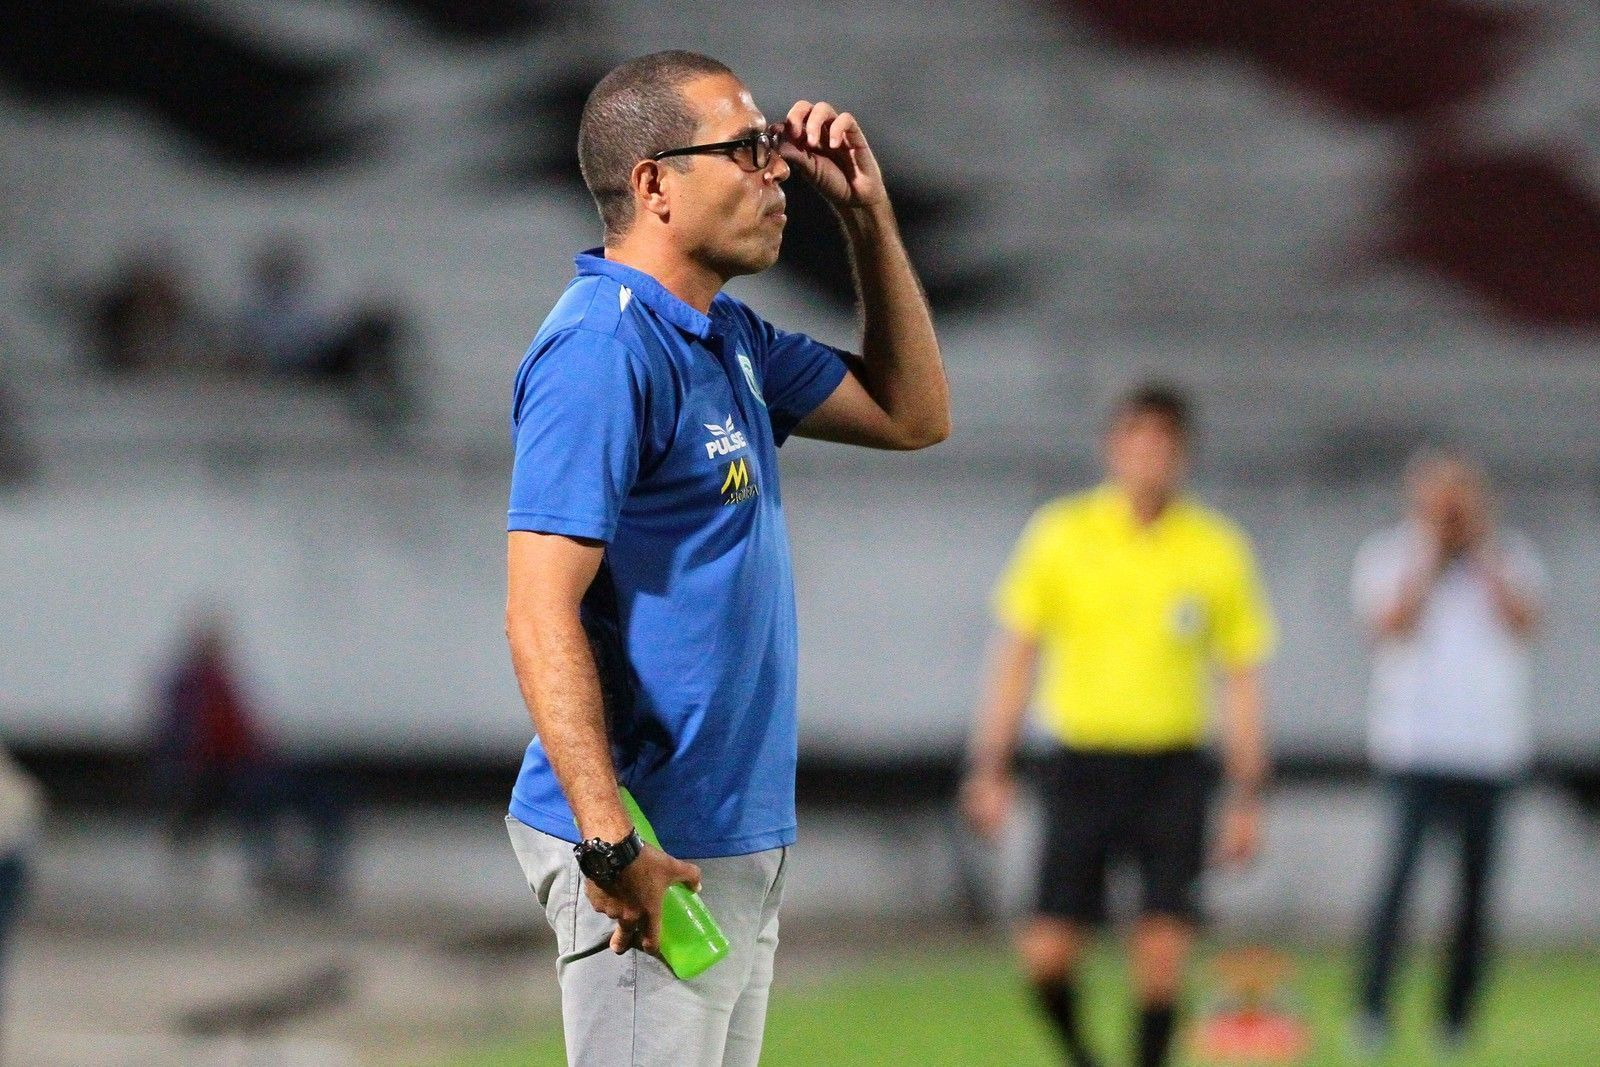 (Foto: Marlon Costa / Pernambuco Press).